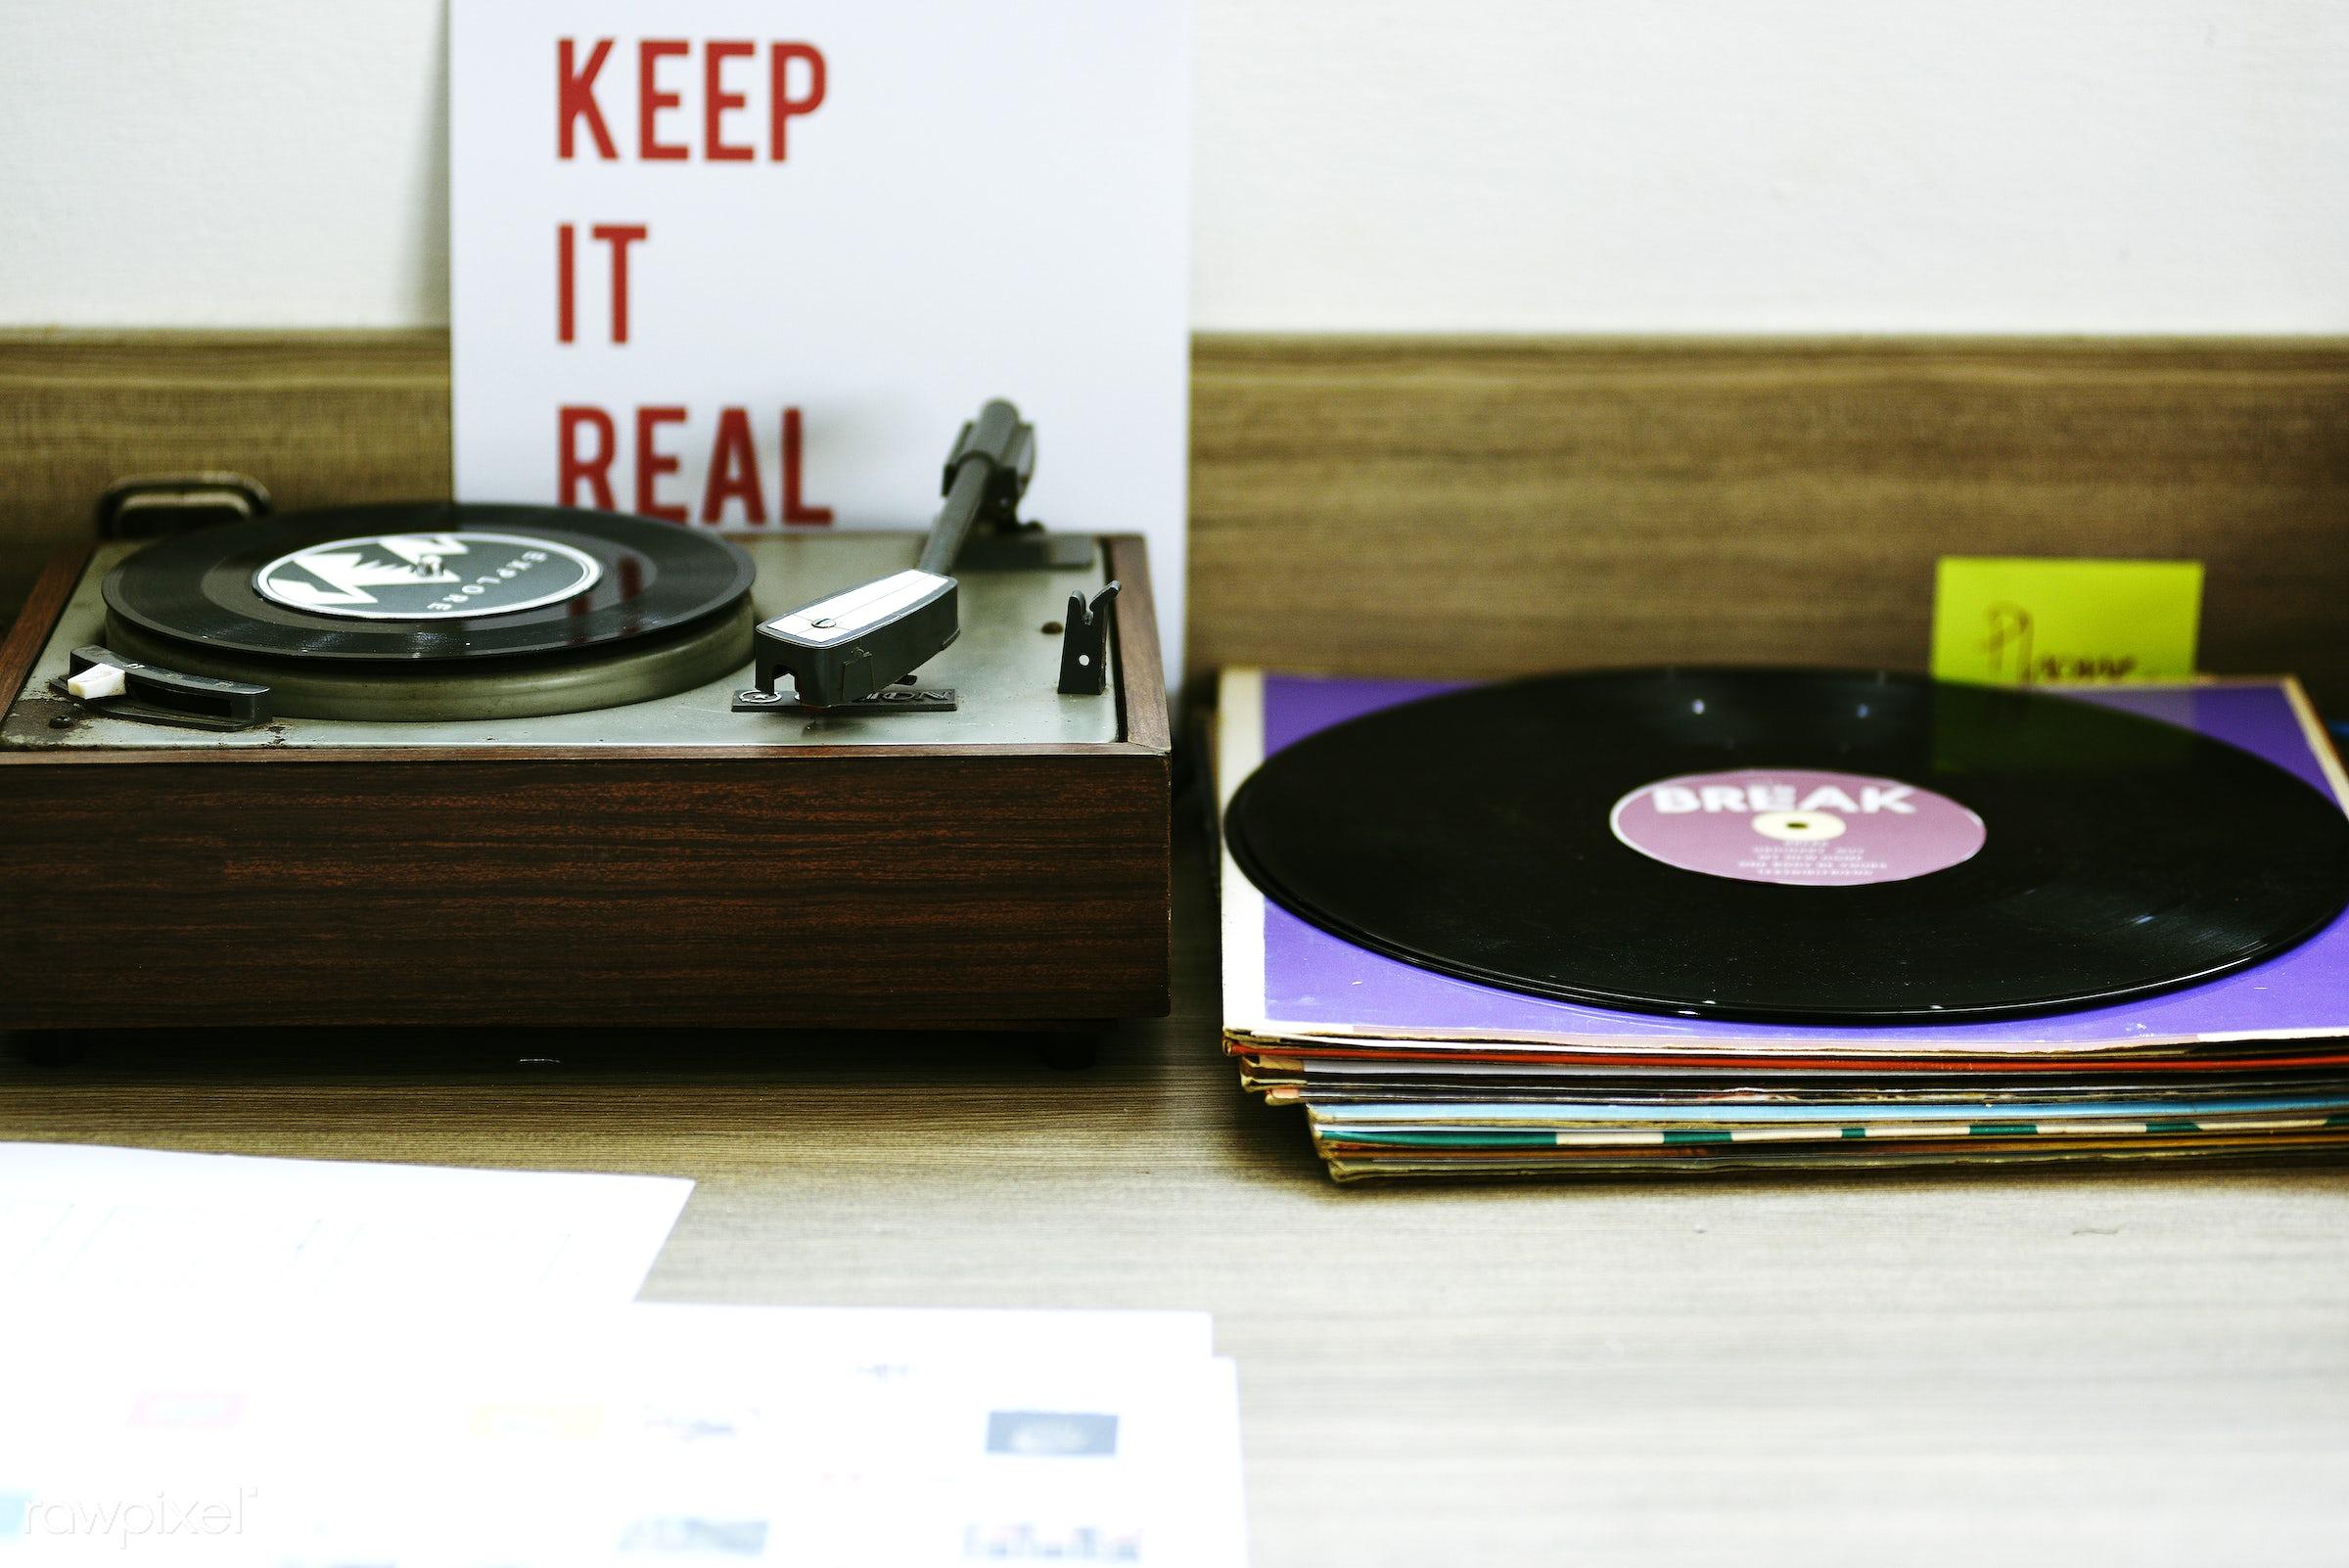 audio, classic, disc, disco, disk, entertain, entertainment, gramophone, keep it real, leisure, media, music, nobody,...